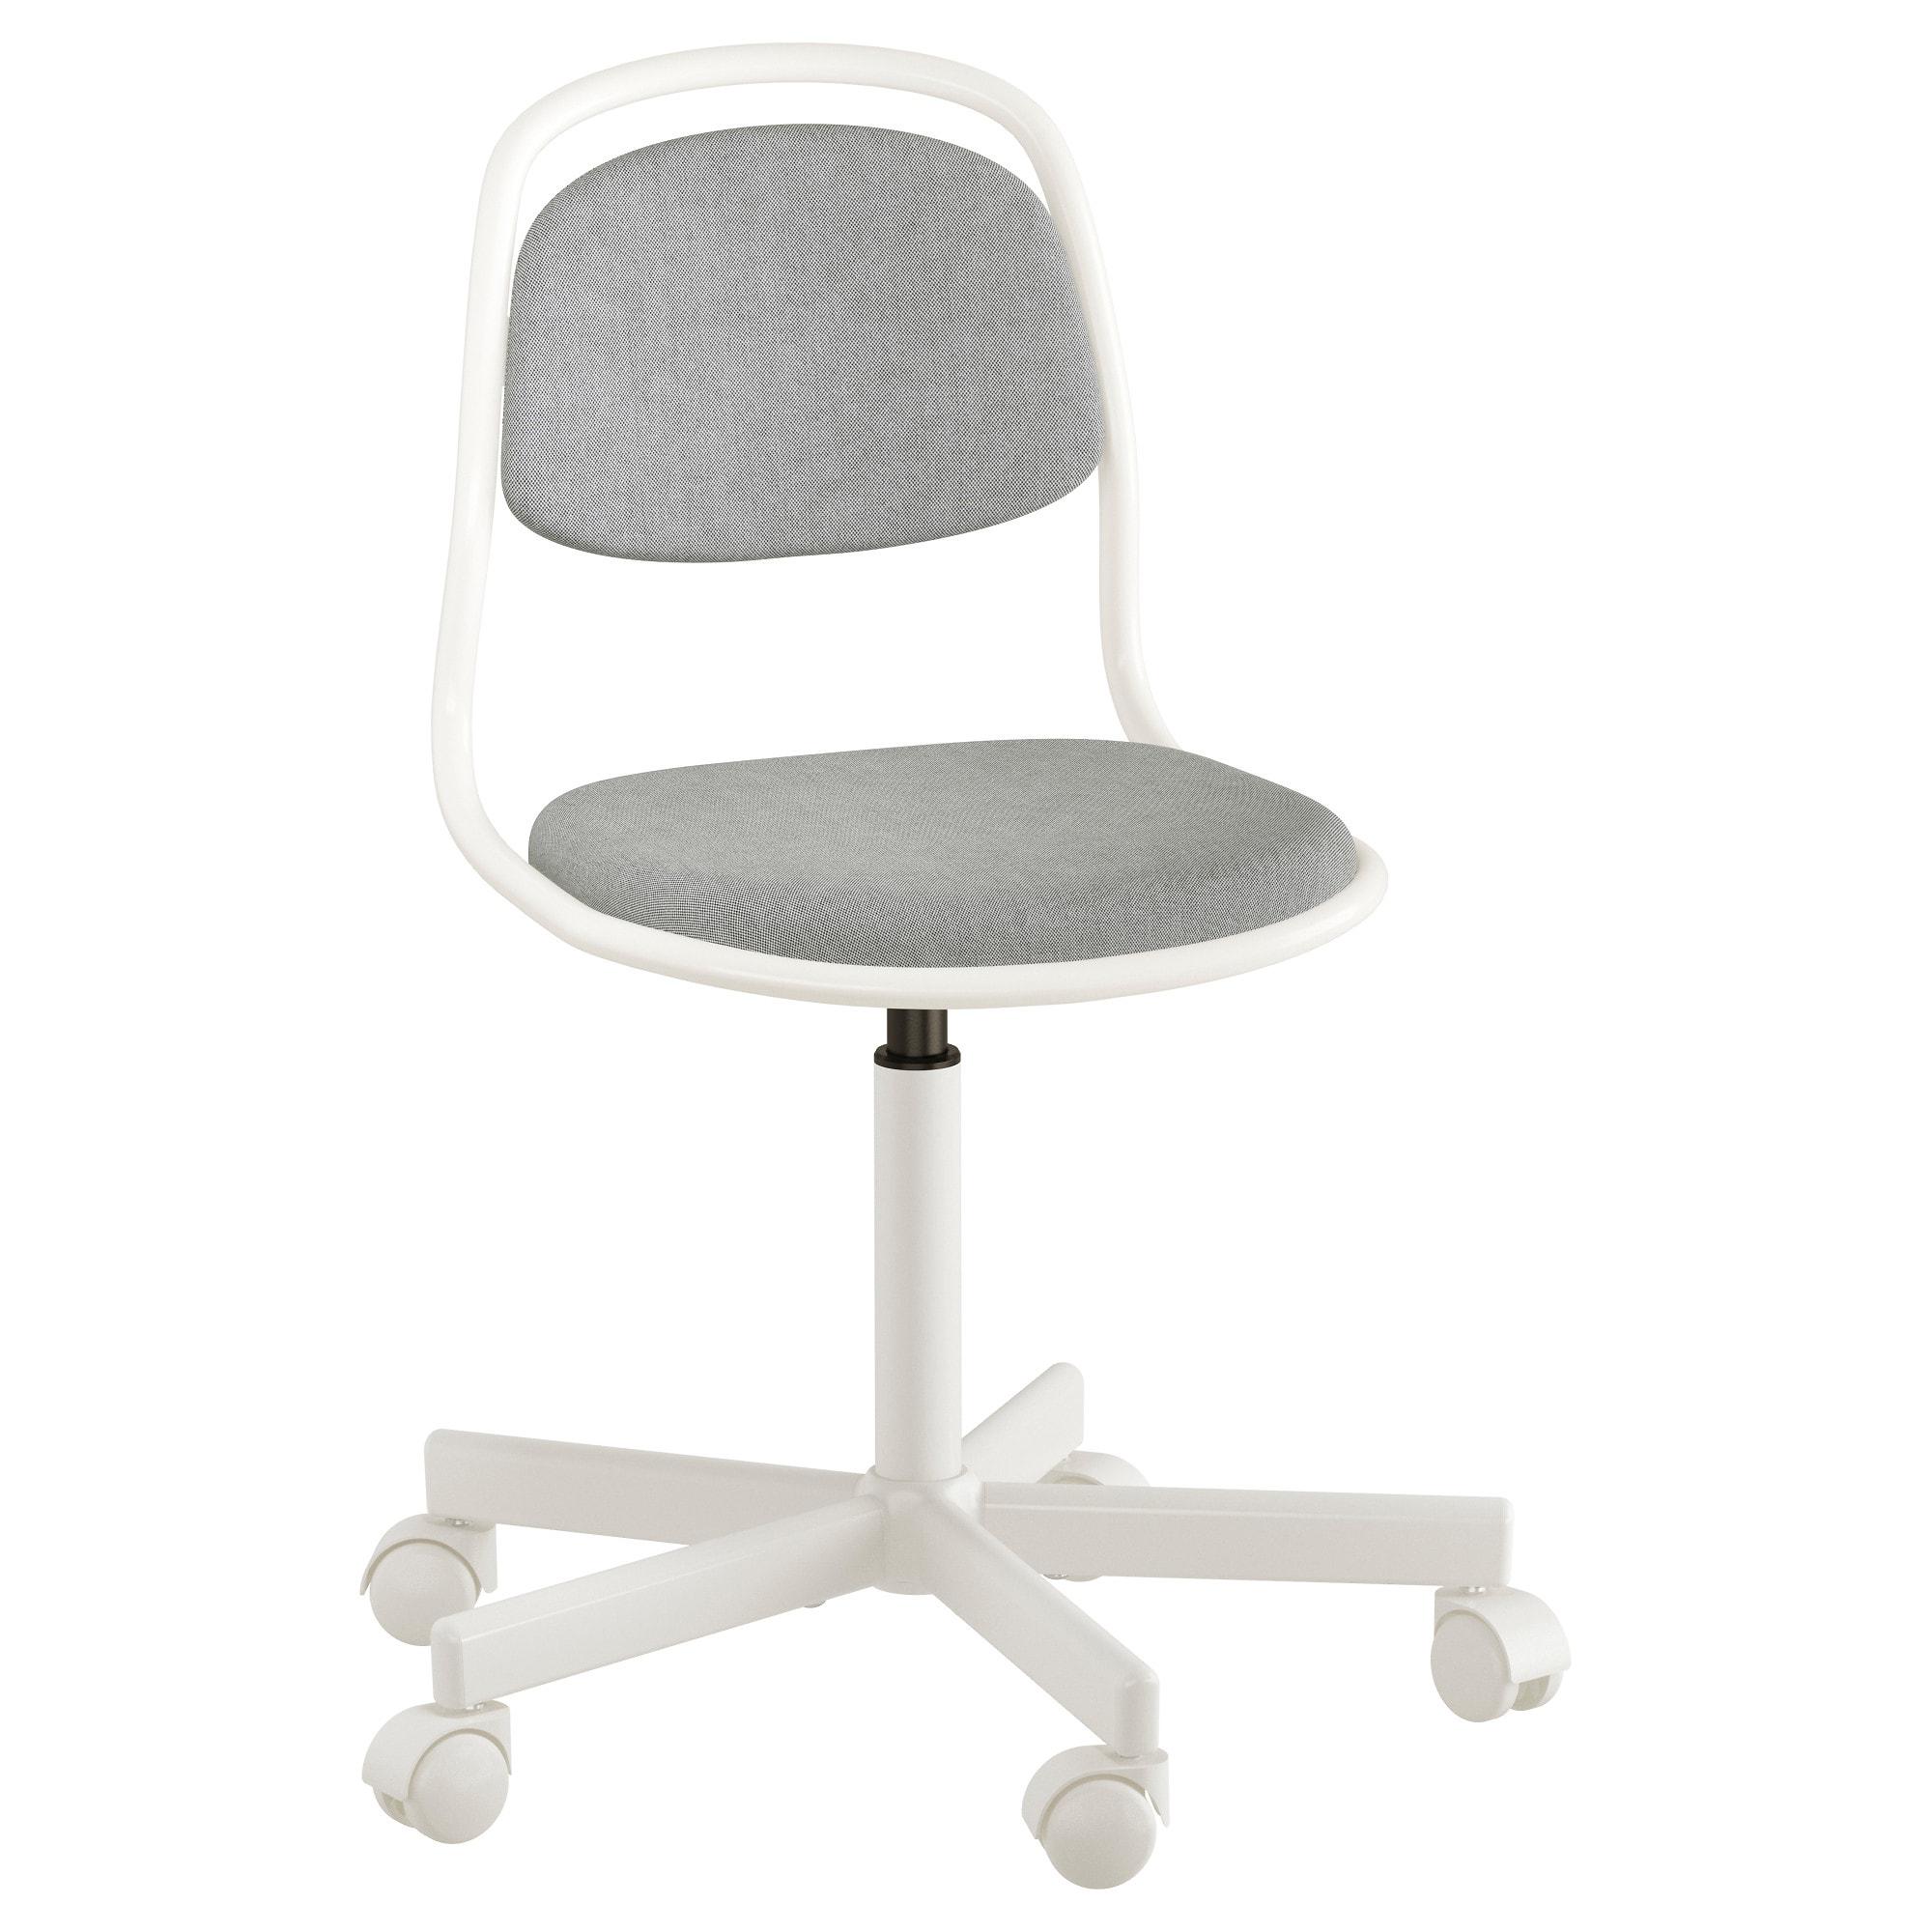 Silla Oficina Diseño Ipdd à Rfjà Ll Silla Escritorio Nià O Blanco Vissle Gris Claro Ikea